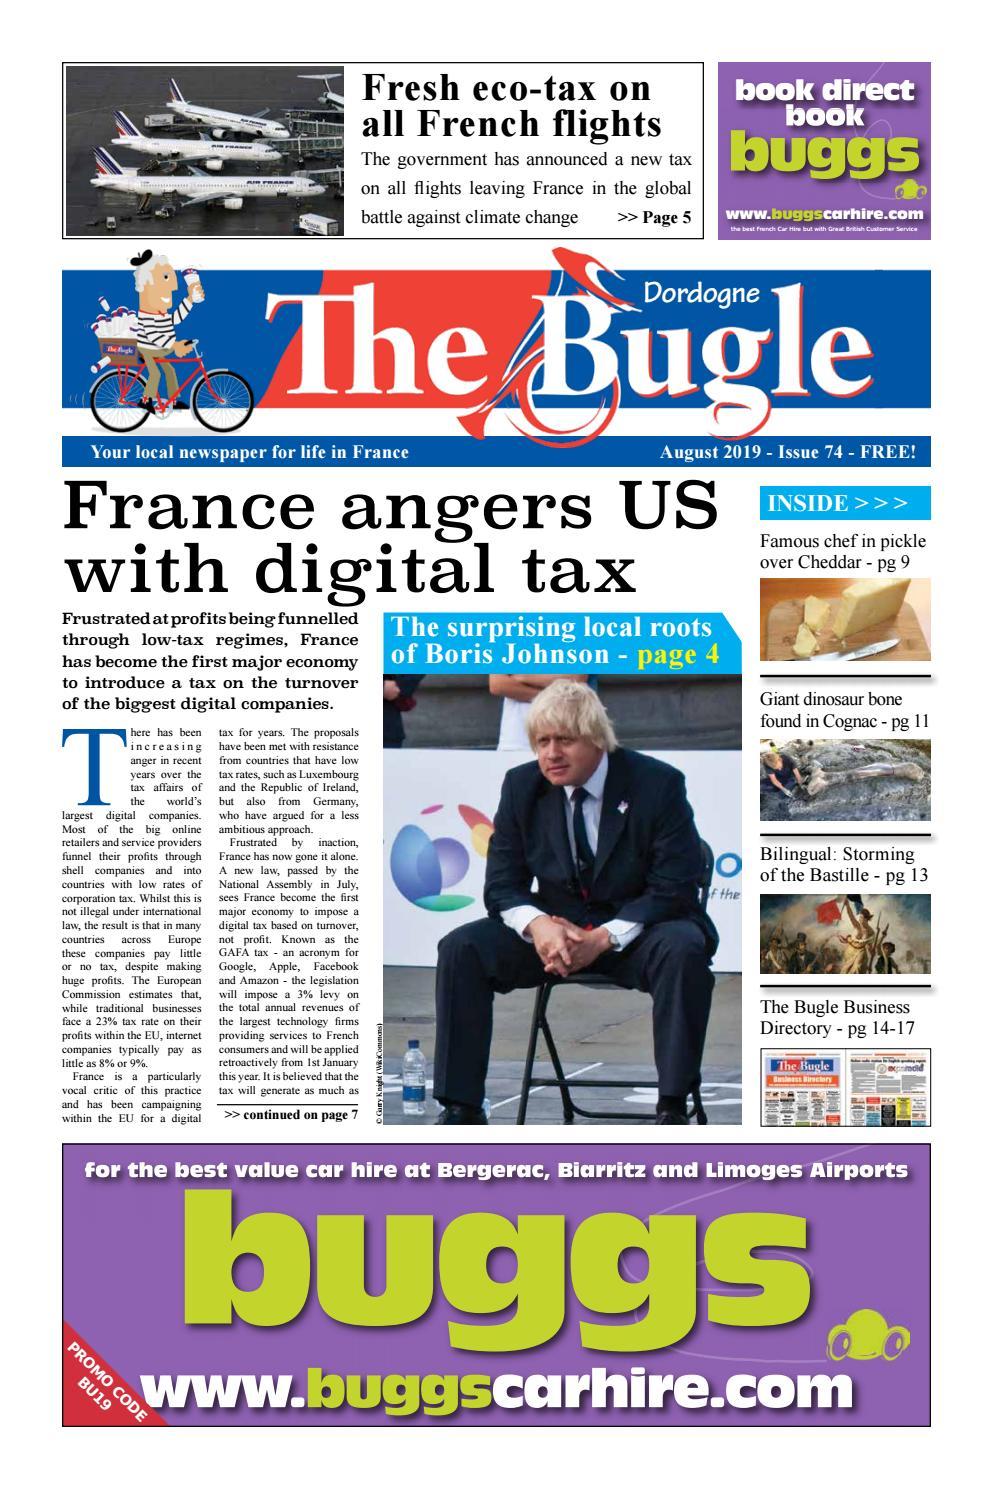 The Bugle Dordogne Aug 2019 By The Bugle Issuu